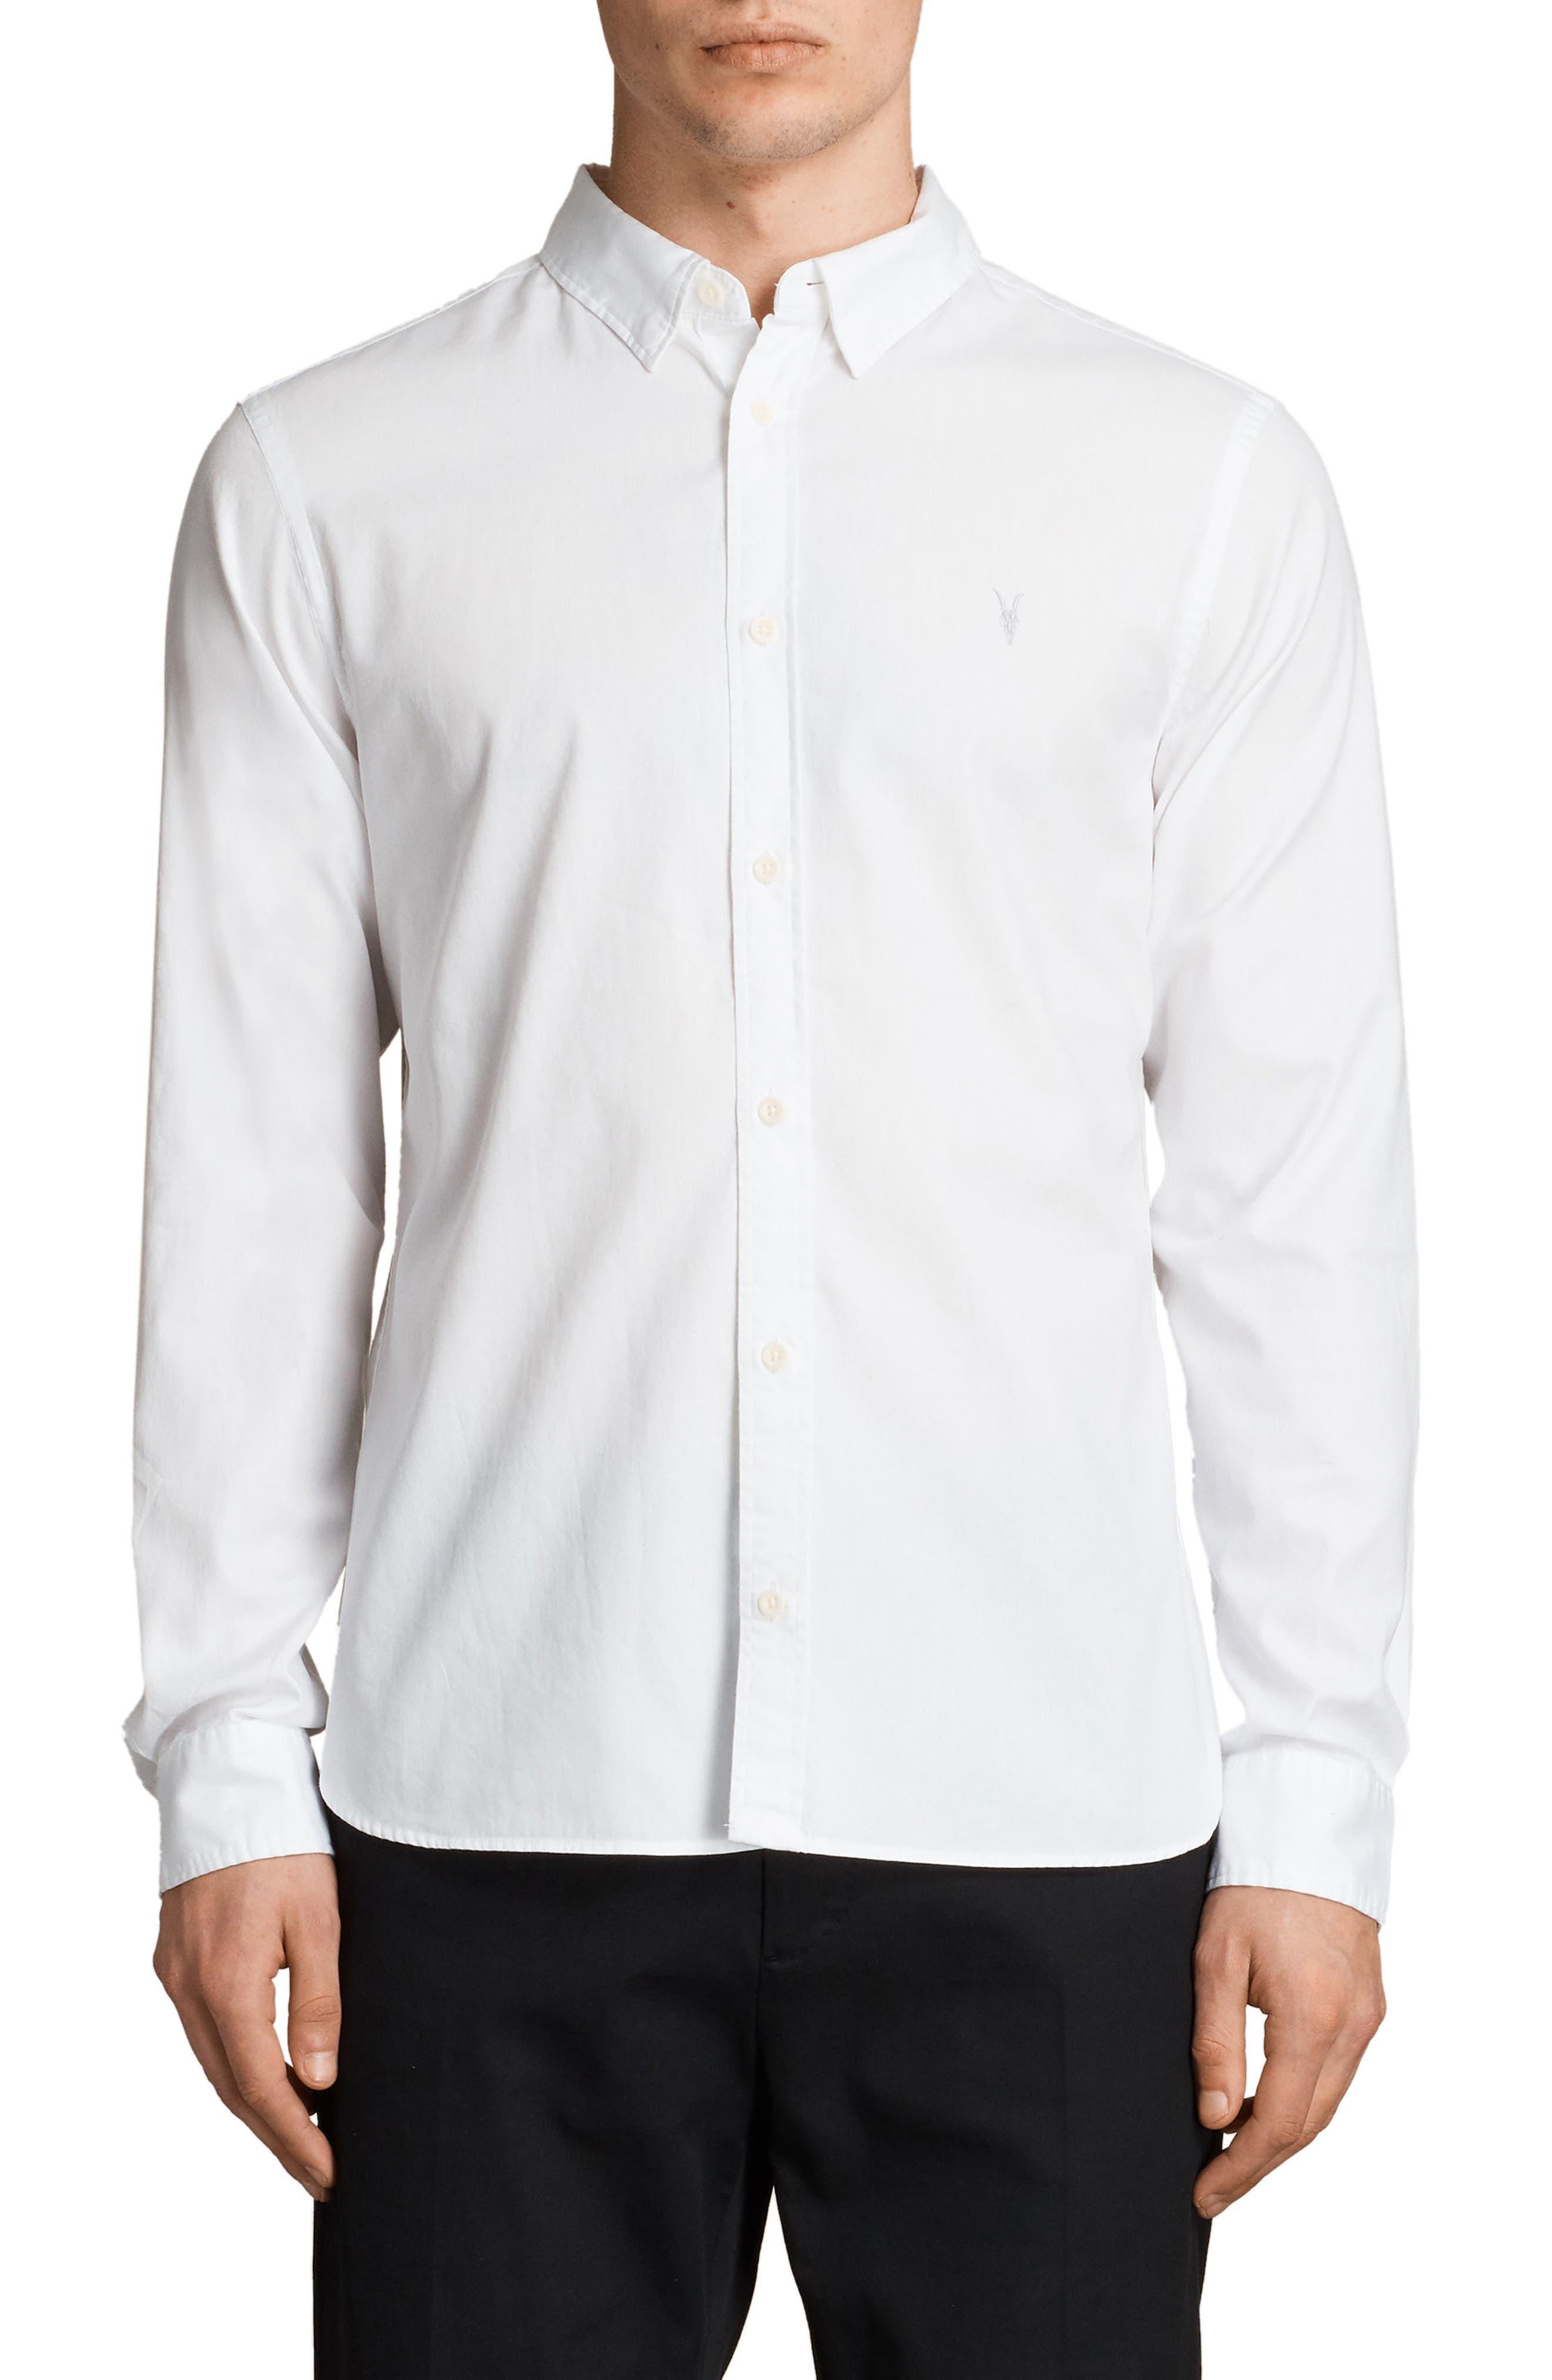 Redondo Slim Fit Shirt,                         Main,                         color, White